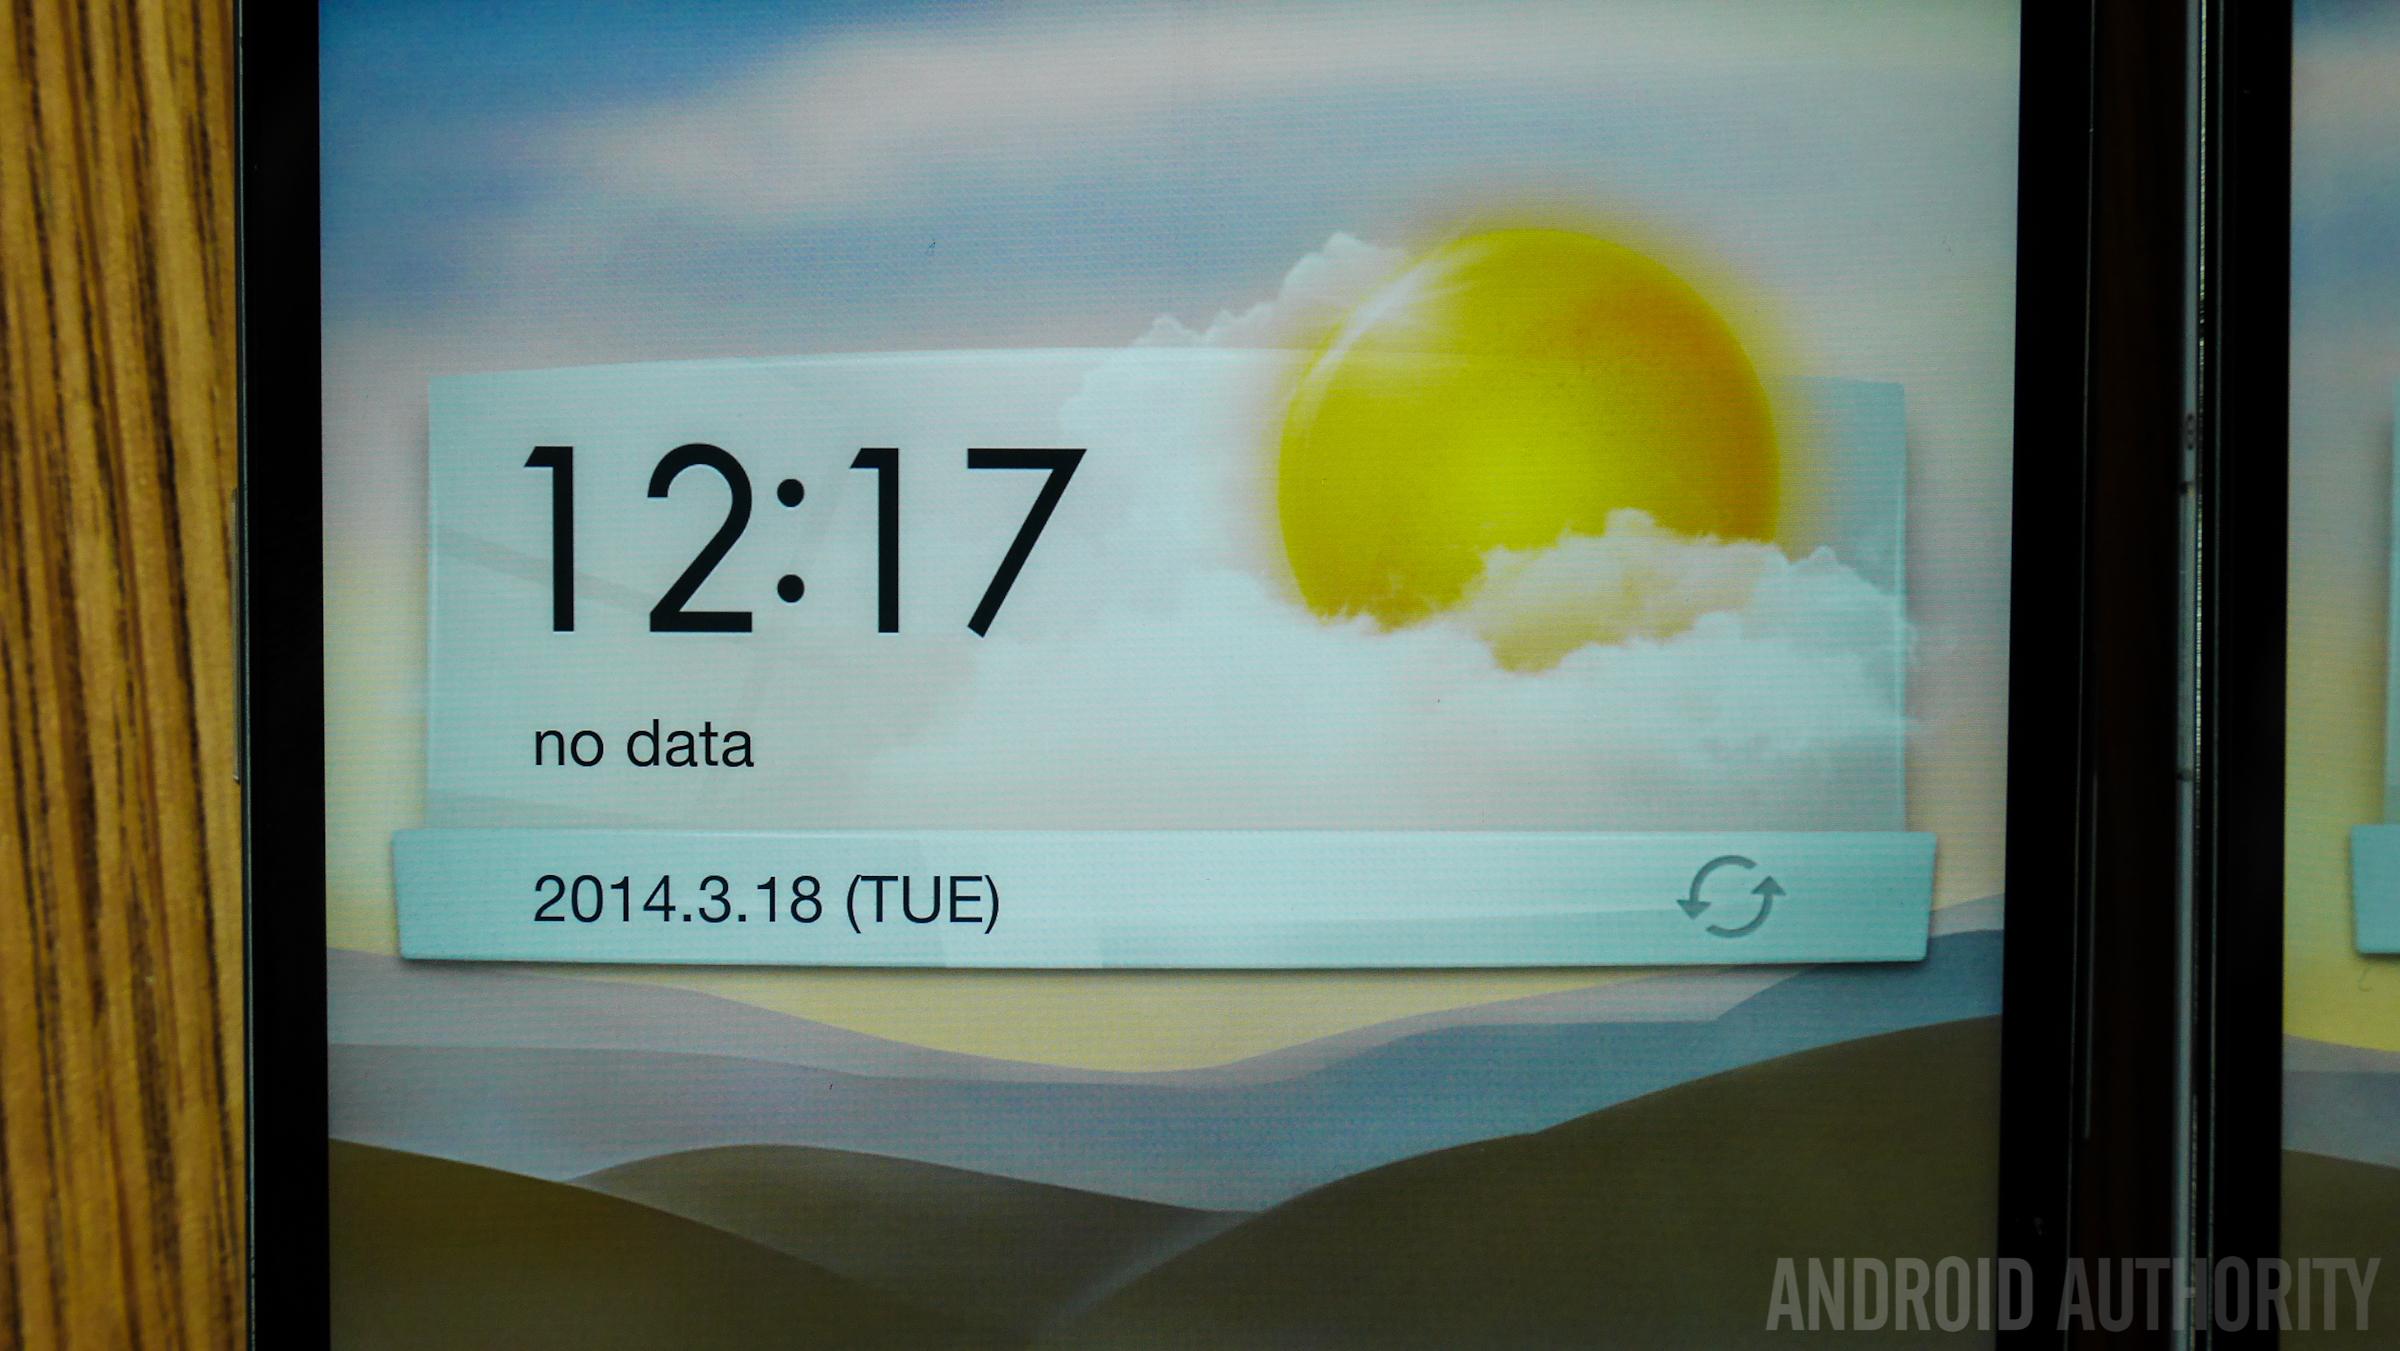 Double Oppo Find 5 Full Hd Vs Quad Hd 1440p Vs 1080p 24 Inch 1440p Vs 1080p Difference dpreview 1440p Vs 1080p